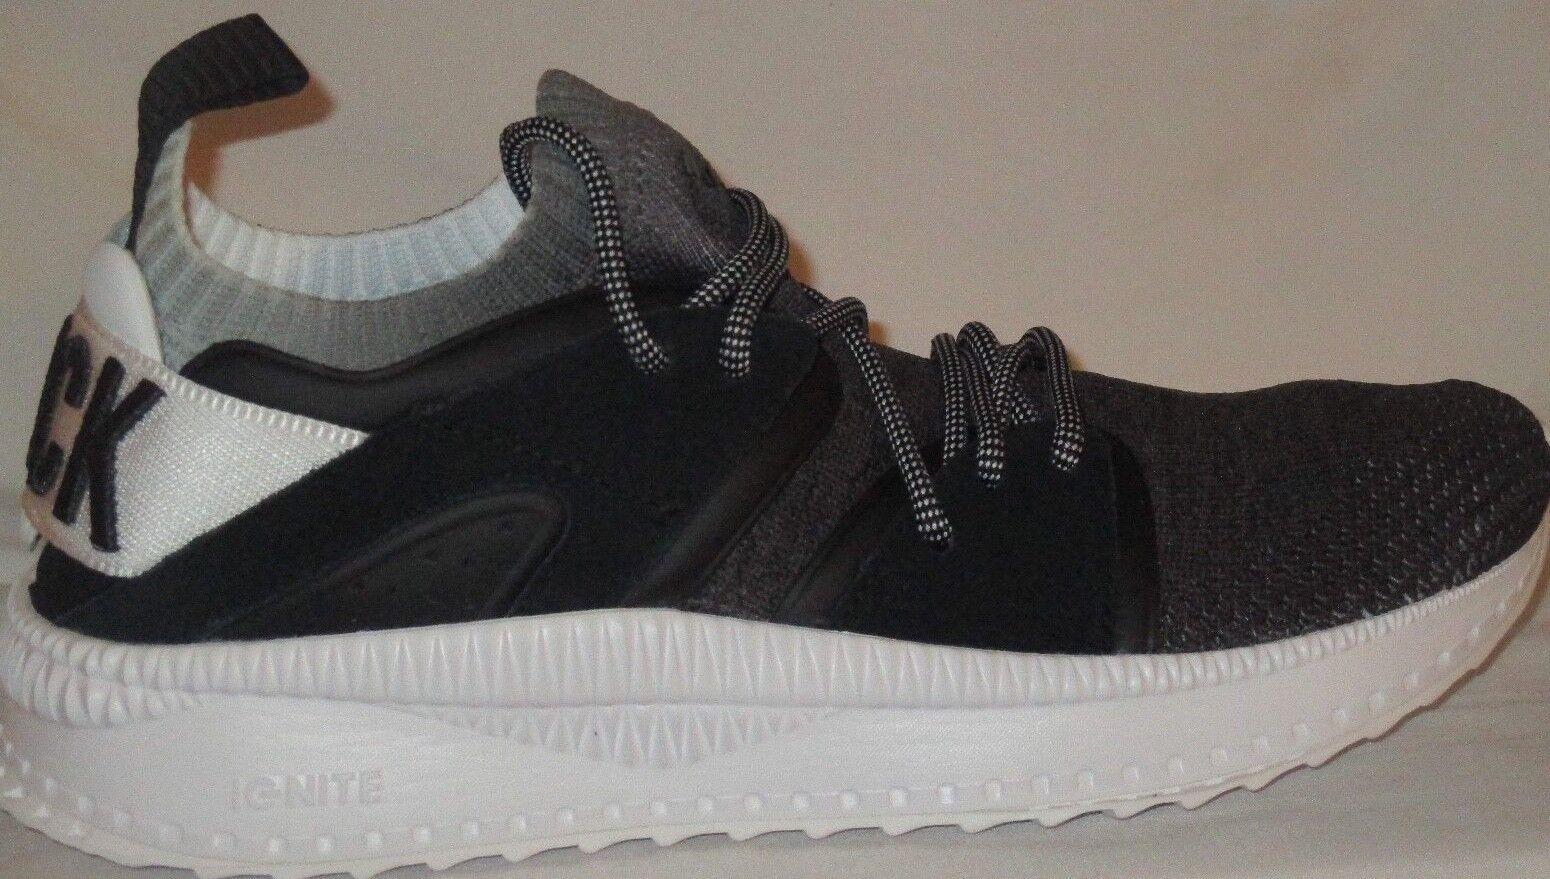 Hombres PUMA TSUGI BLAZE EVOKNIT BLK SCL negro blancoo RUNNING zapatos Talla 9.5